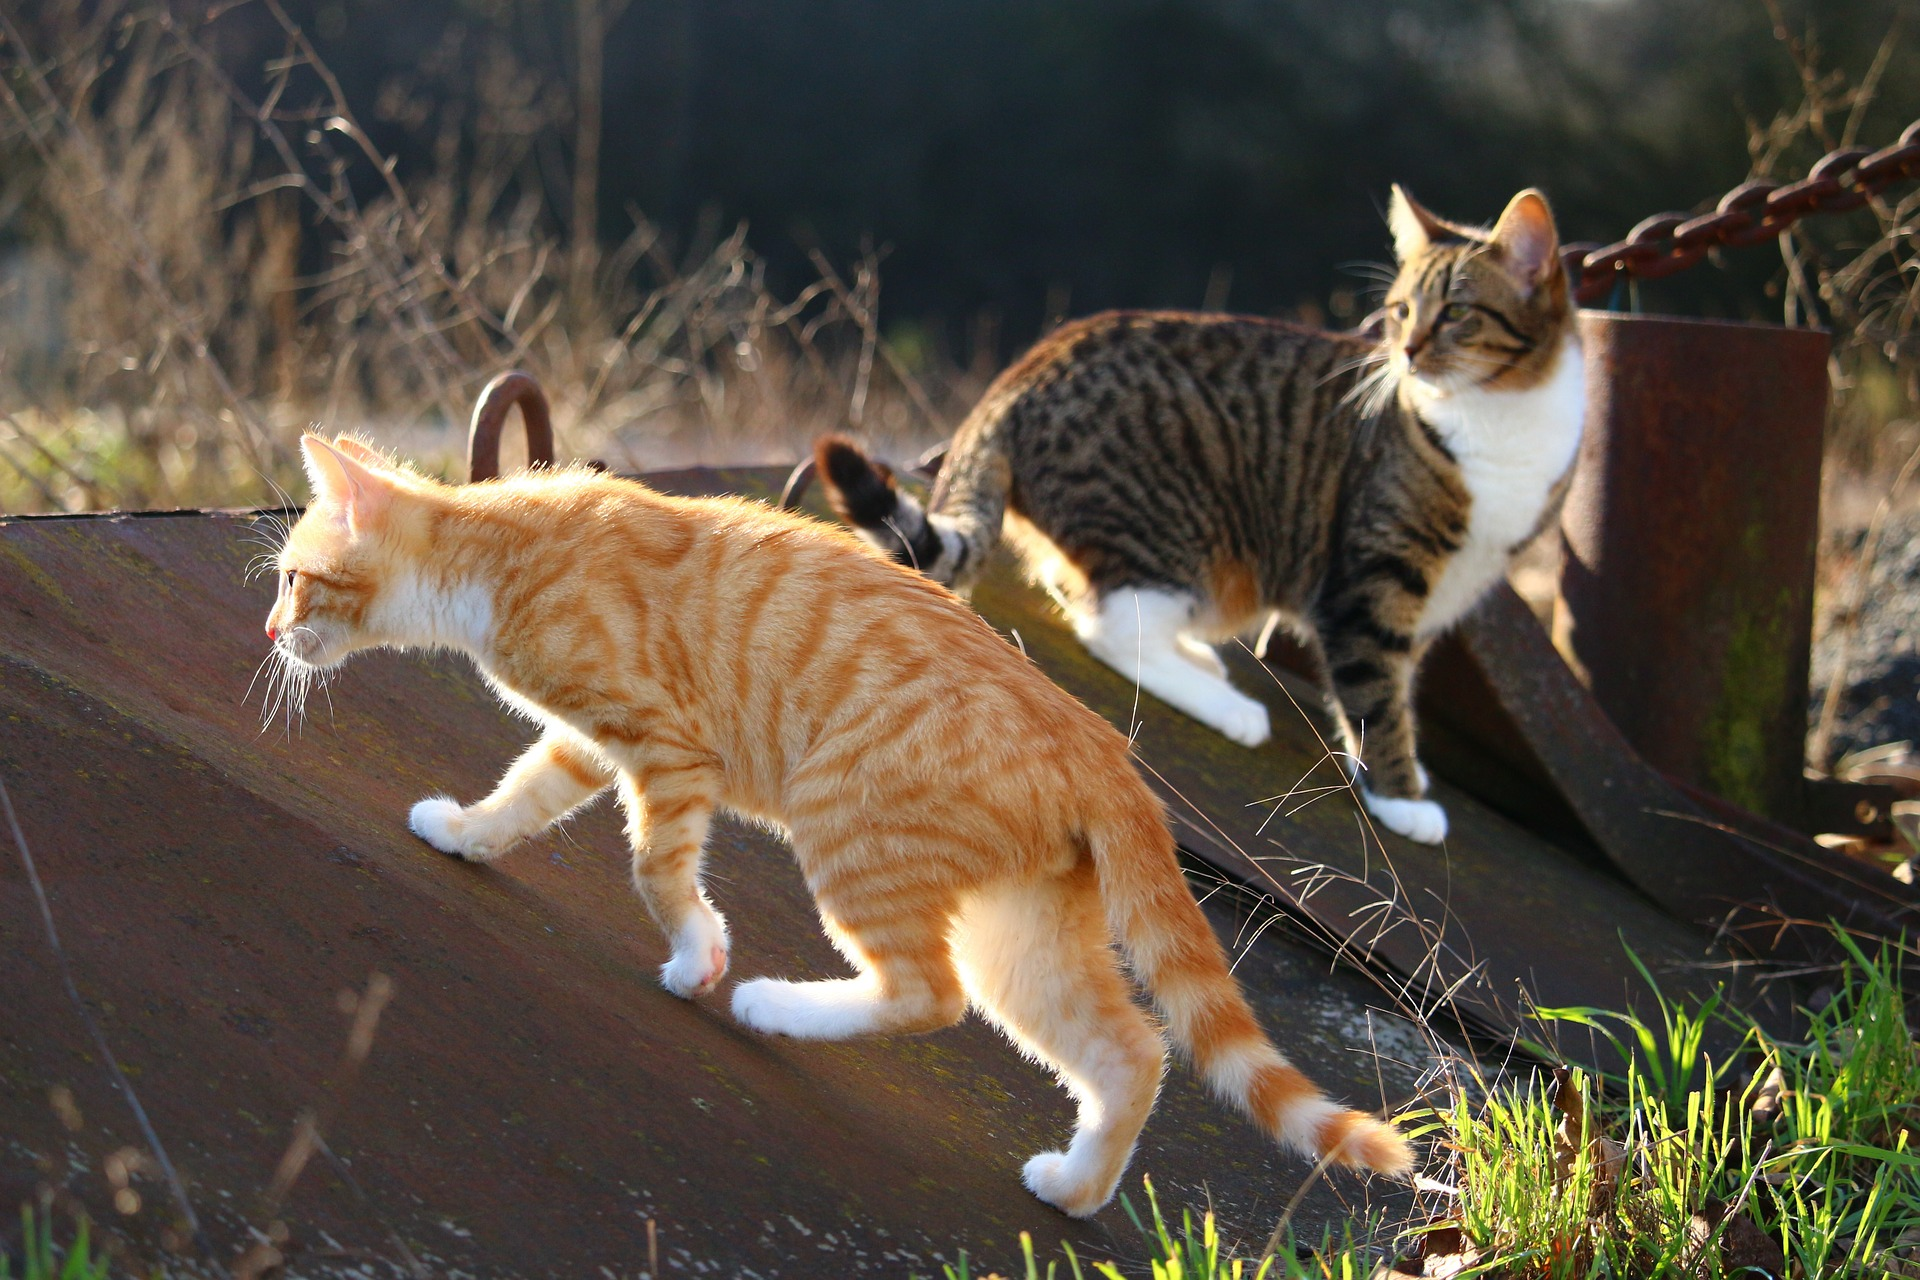 cat-1183095_1920.jpg